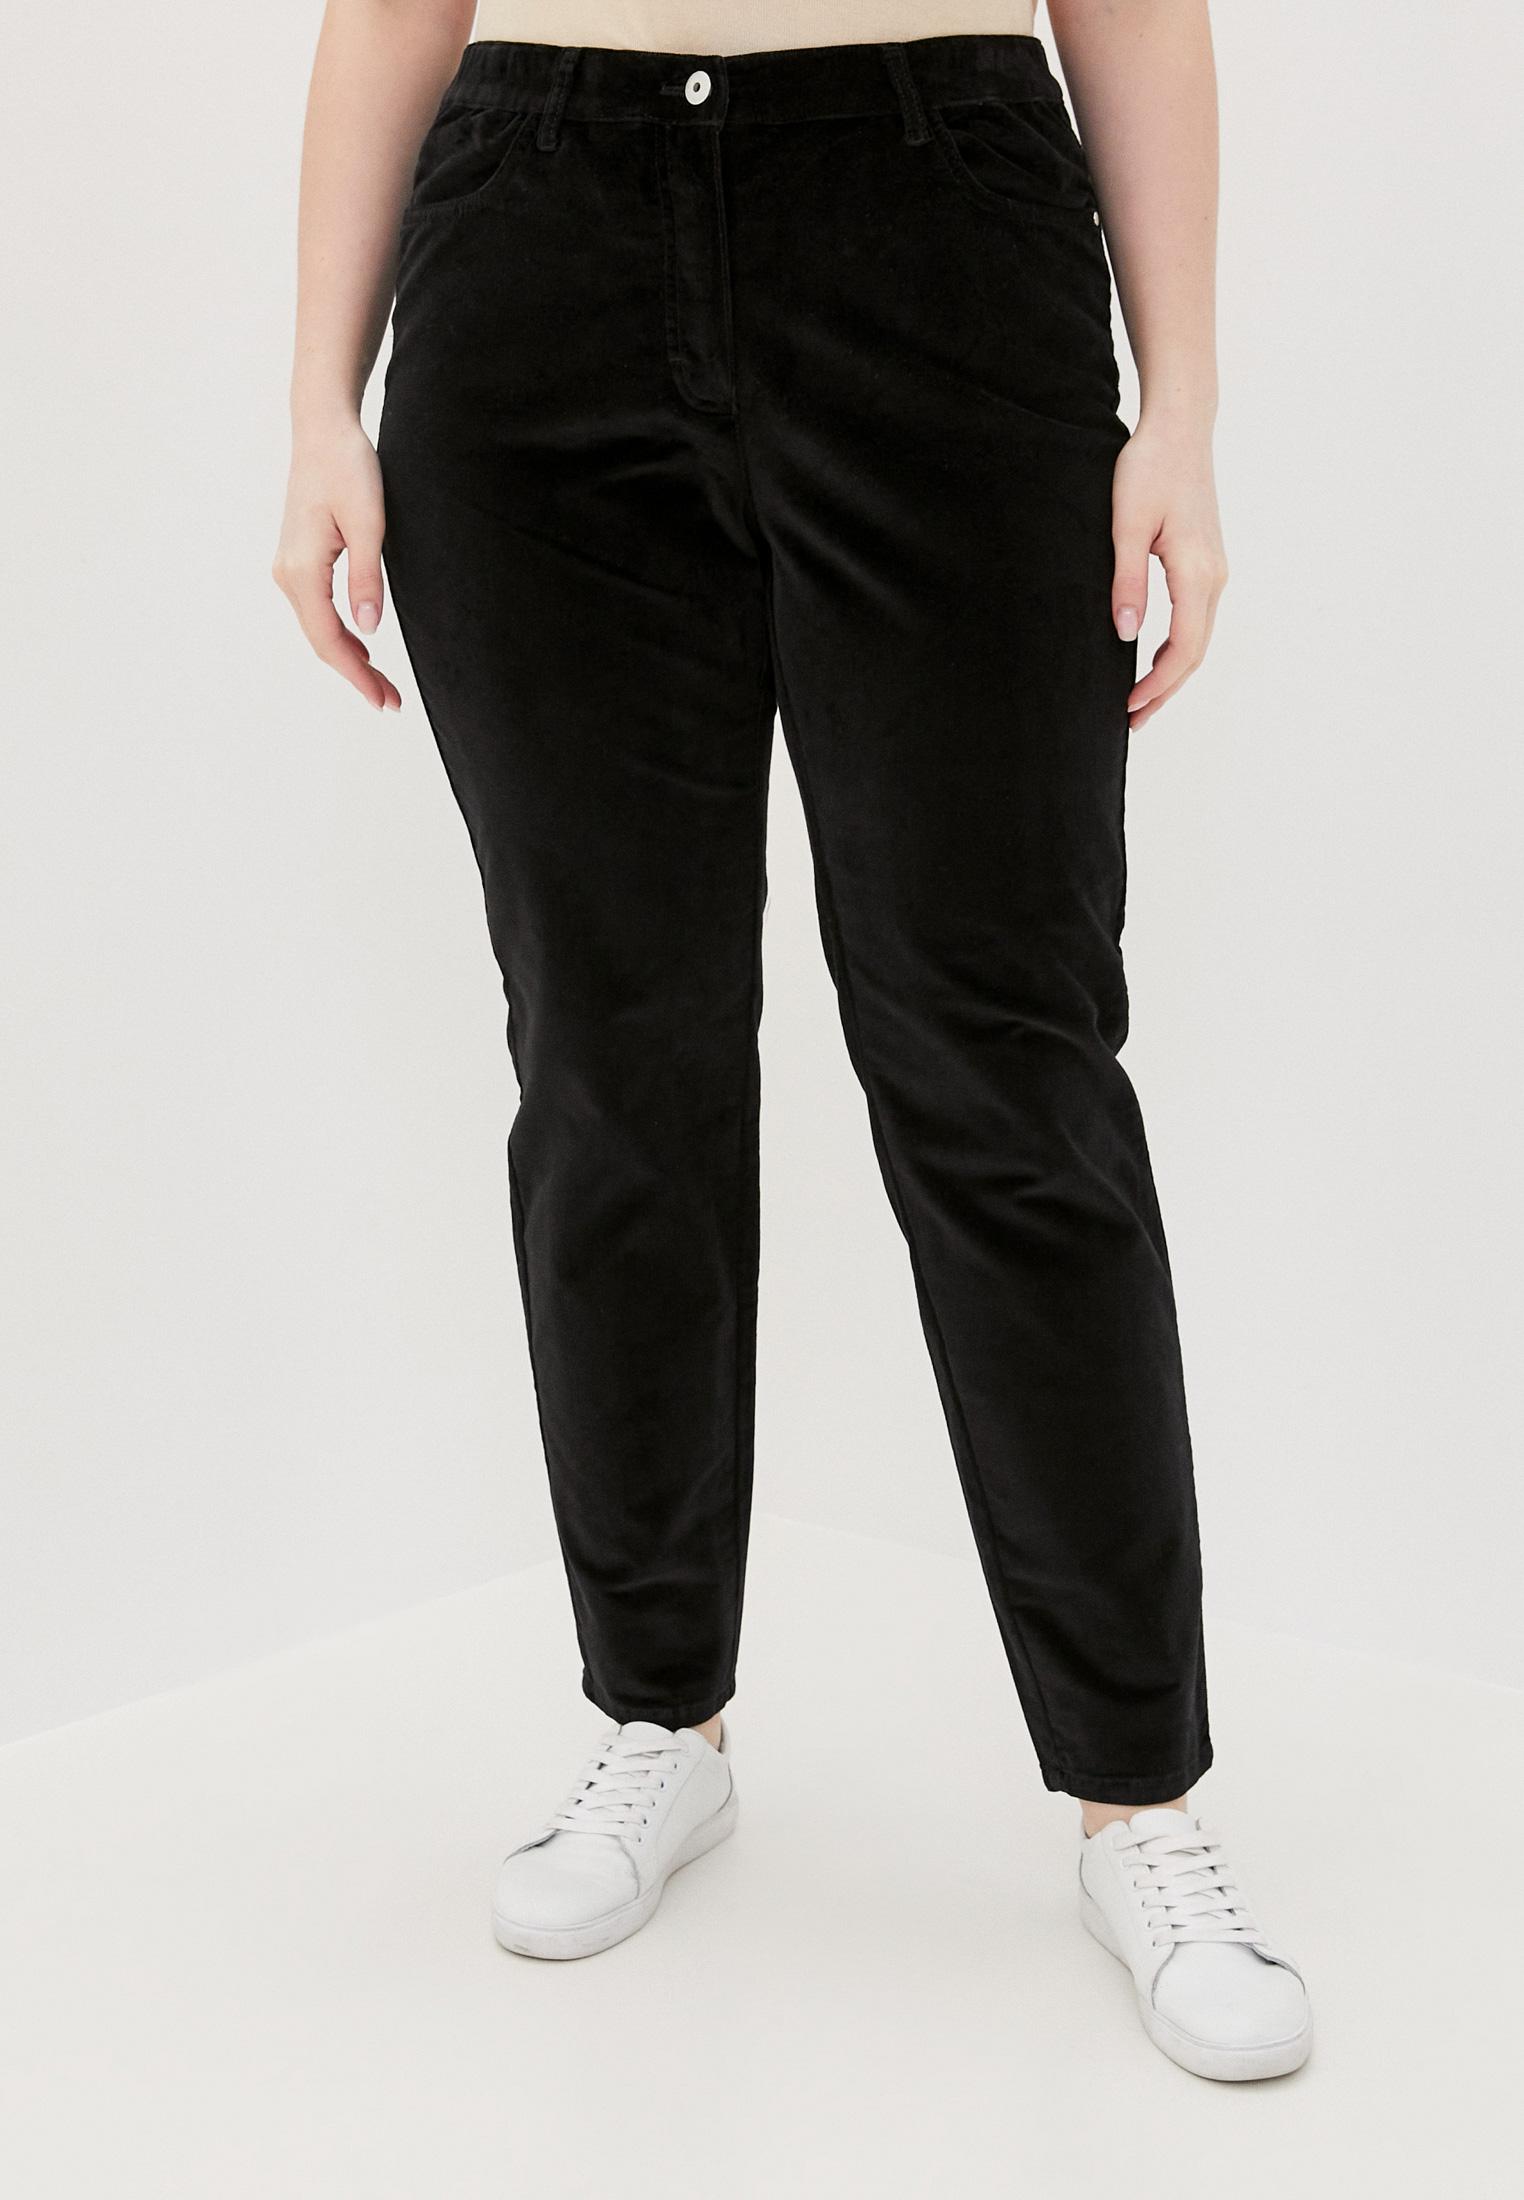 Женские зауженные брюки Samoon by Gerry Weber 320024-21382